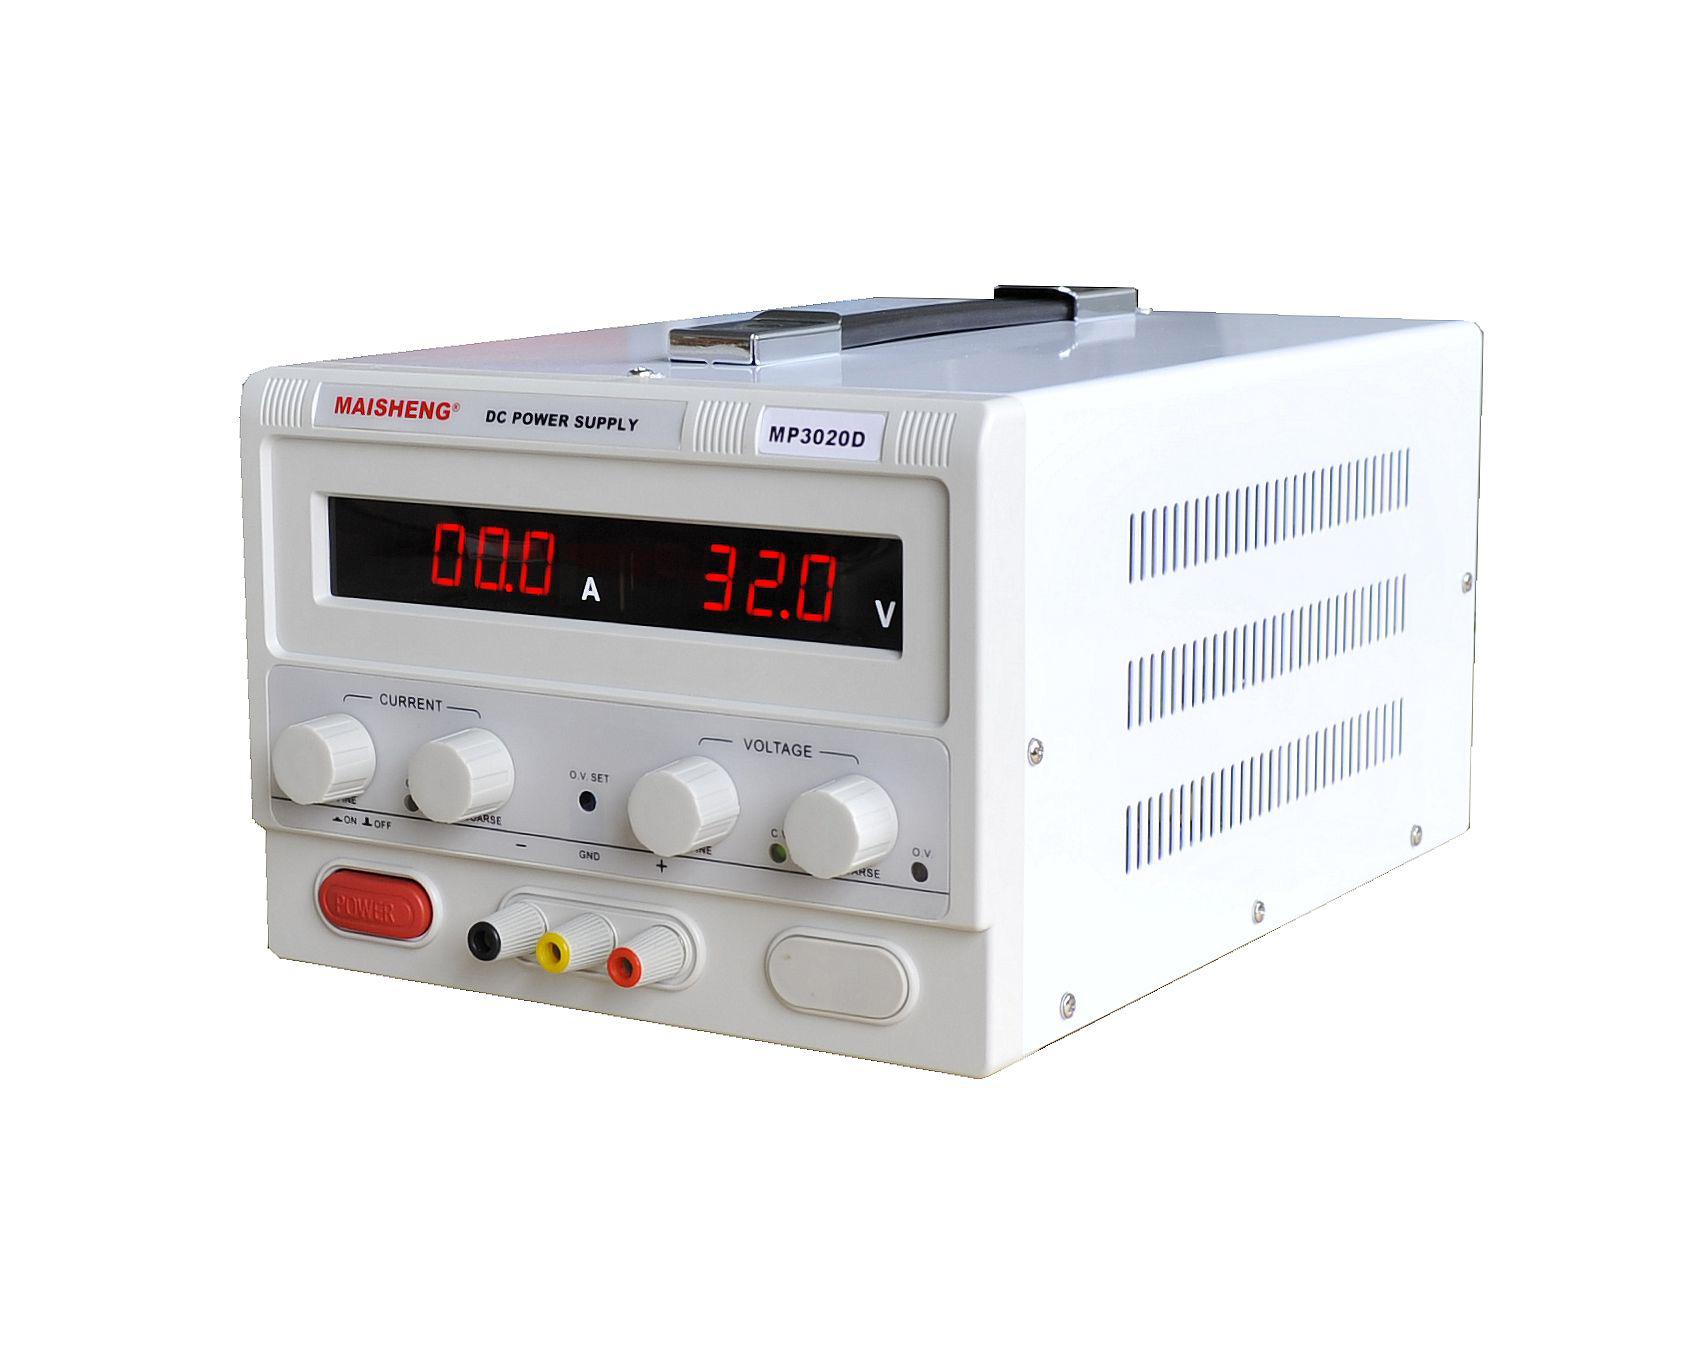 MP3030D:0-30V/0-30A 产品特点: 1. 加厚钢板机箱,美观大方,坚固耐用。提手设计,方便搬运。 2. 电压采用10圈电位器,精确调整输出电压值。 3. 恒压、恒流自动转换,即可当恒压源使用,亦可当恒流源使用。 4. 保护功能完善:过压保护(OVP),短路限流保护(OCP),过温保护(OTP),过功保护(OPP)。 5.